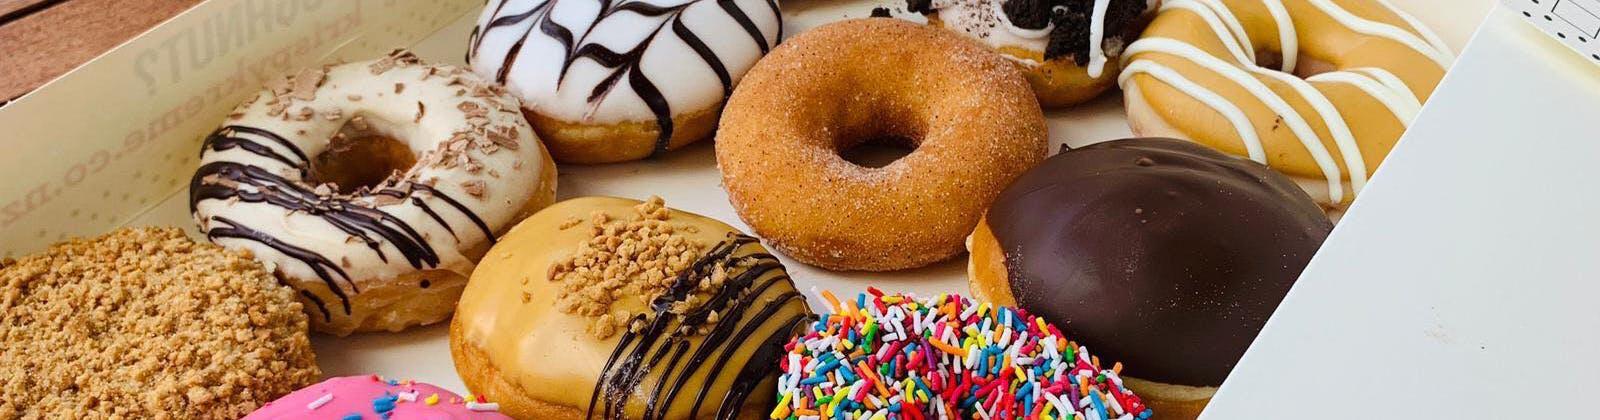 Assorted dozen doughnuts from Krispy Kreme